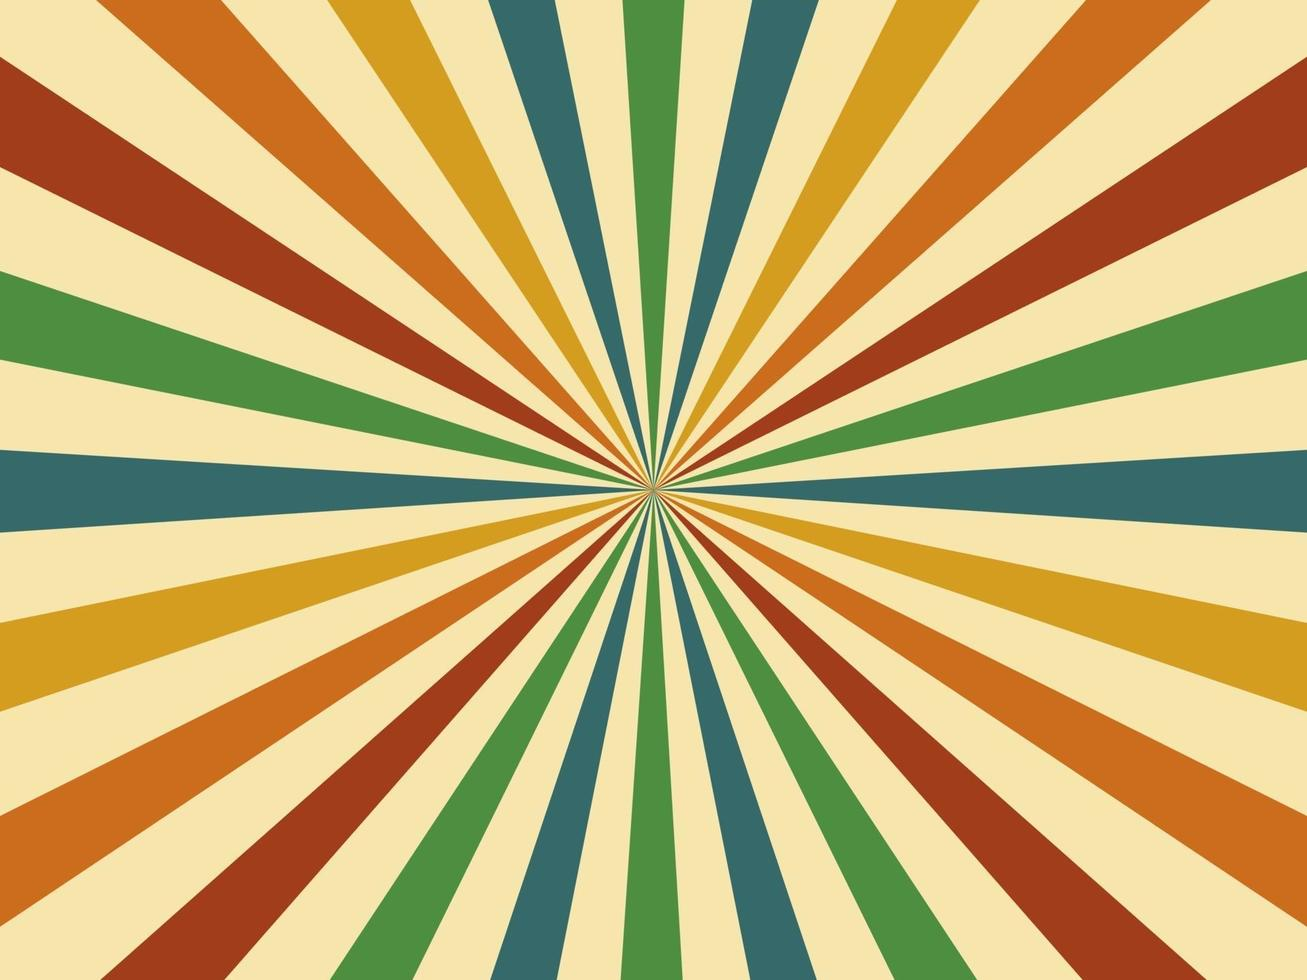 abstrato. Fundo vintage geométrico estilo retro colorido dos anos 60. vetor. ilustração. vetor